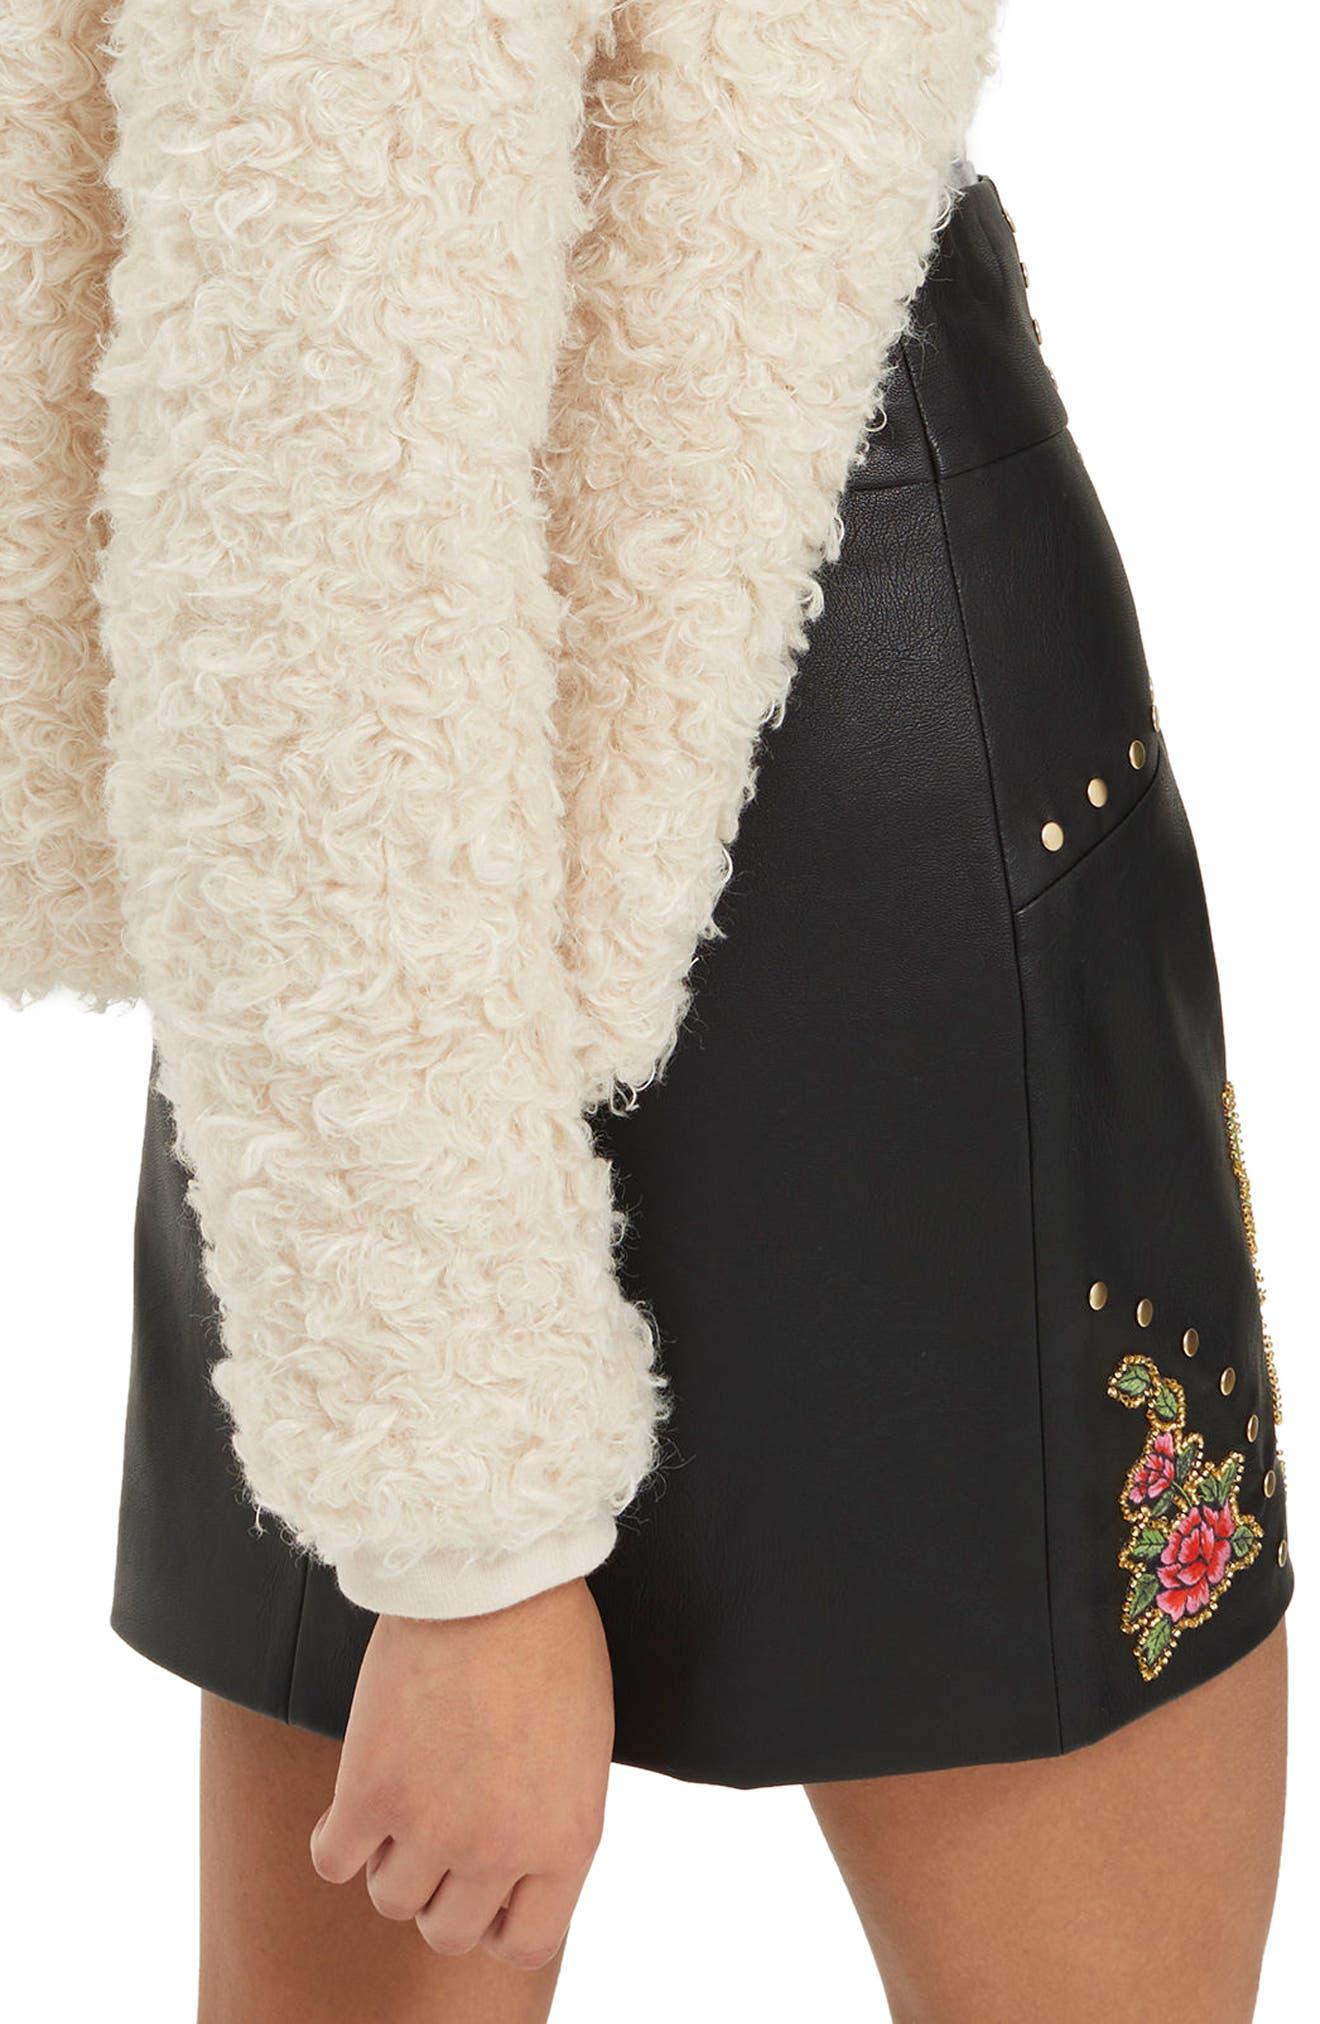 Embellished Floral Faux Leather Skirt,                             Alternate thumbnail 2, color,                             Black Multi